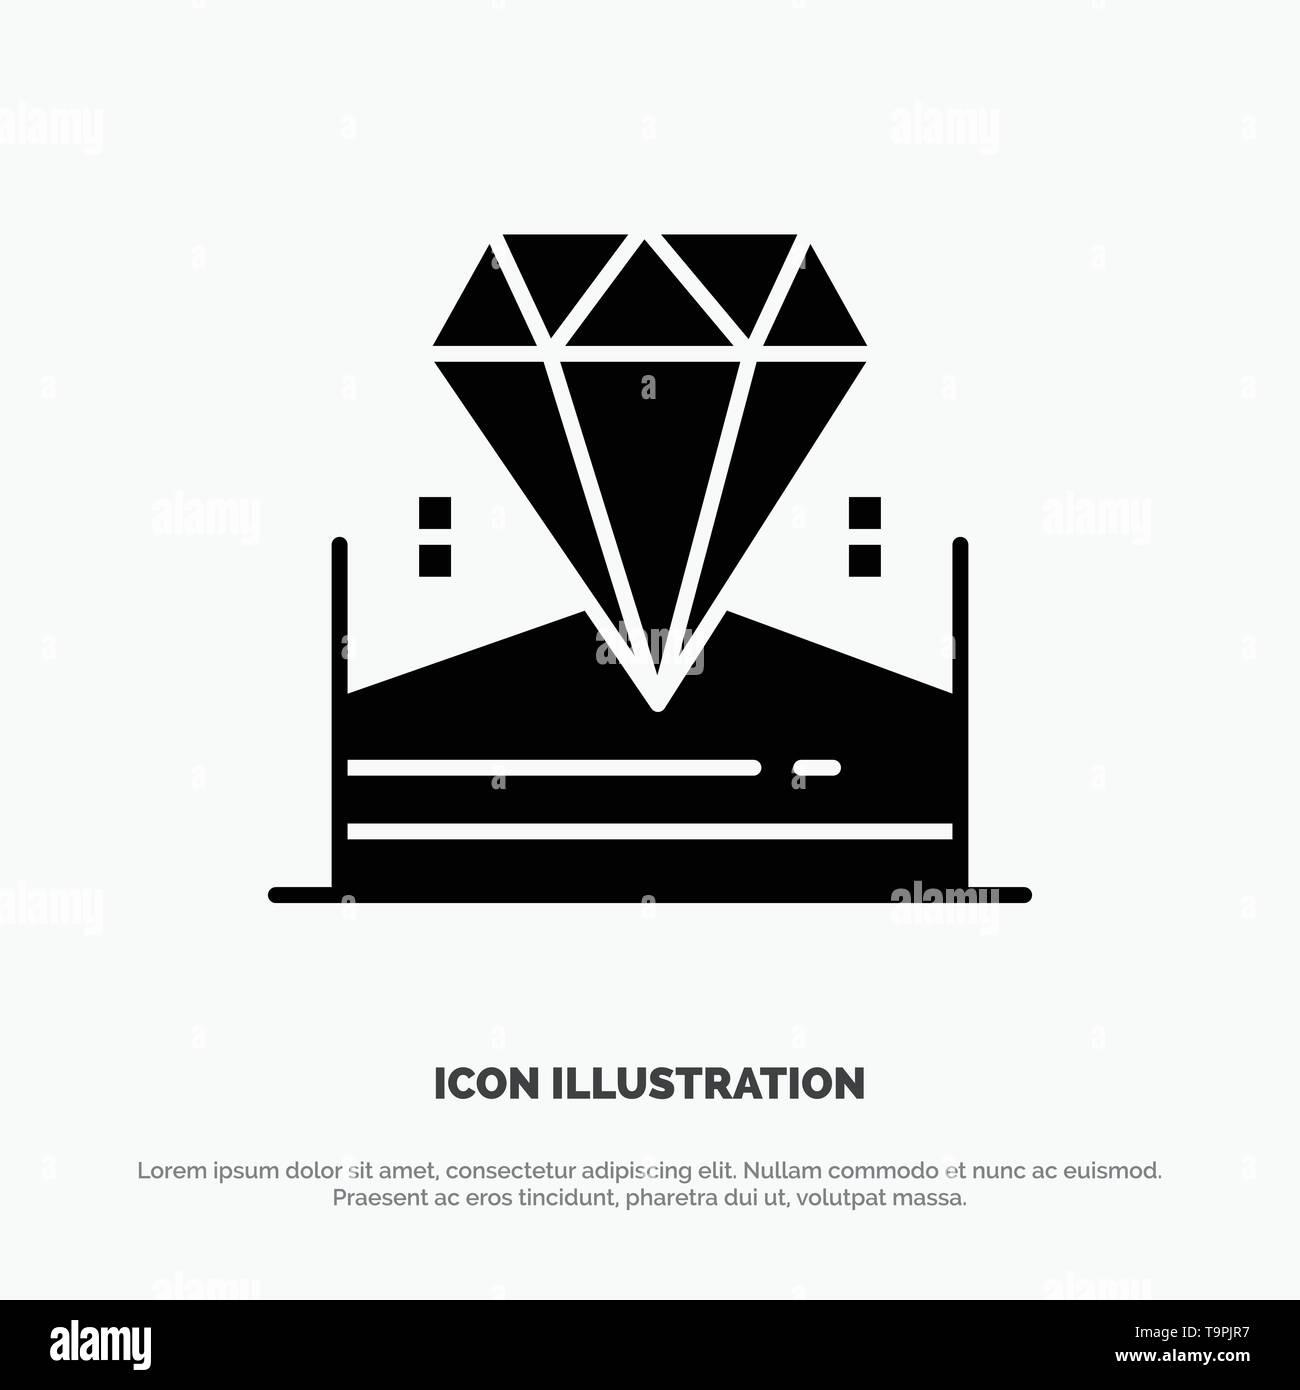 Brilliant, Diamond, Jewel, Hotel Solid Black Glyph Icon - Stock Image